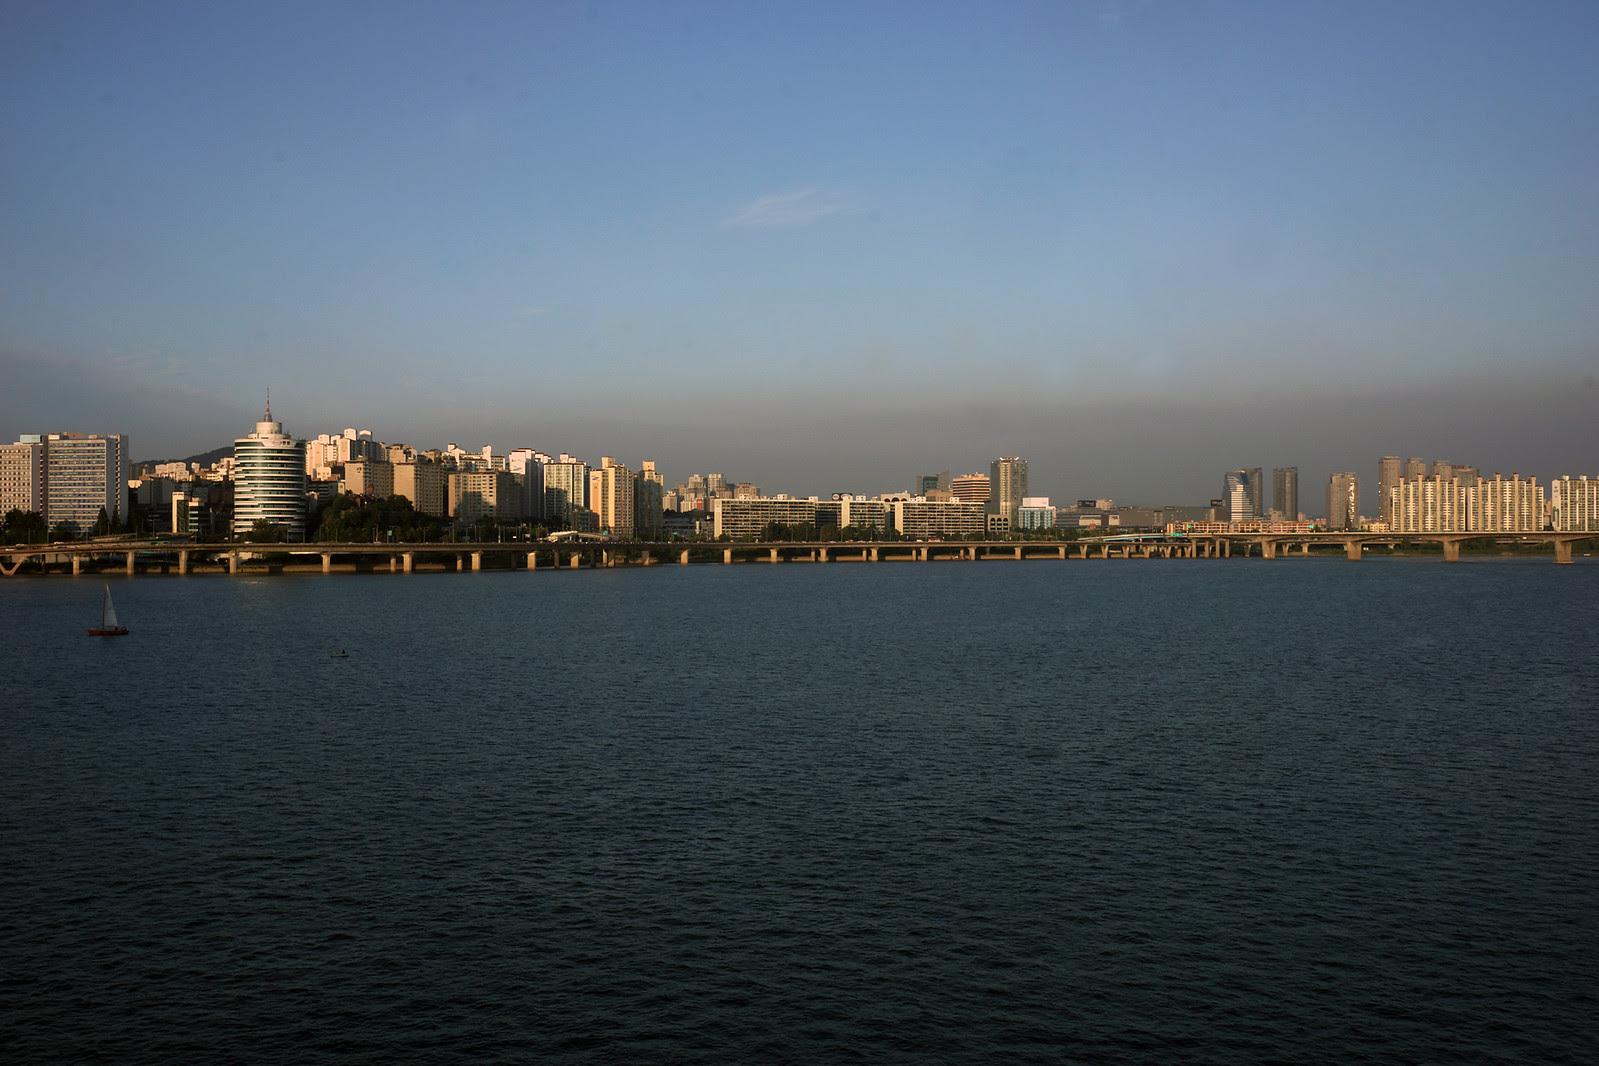 Seoul: Han River 01